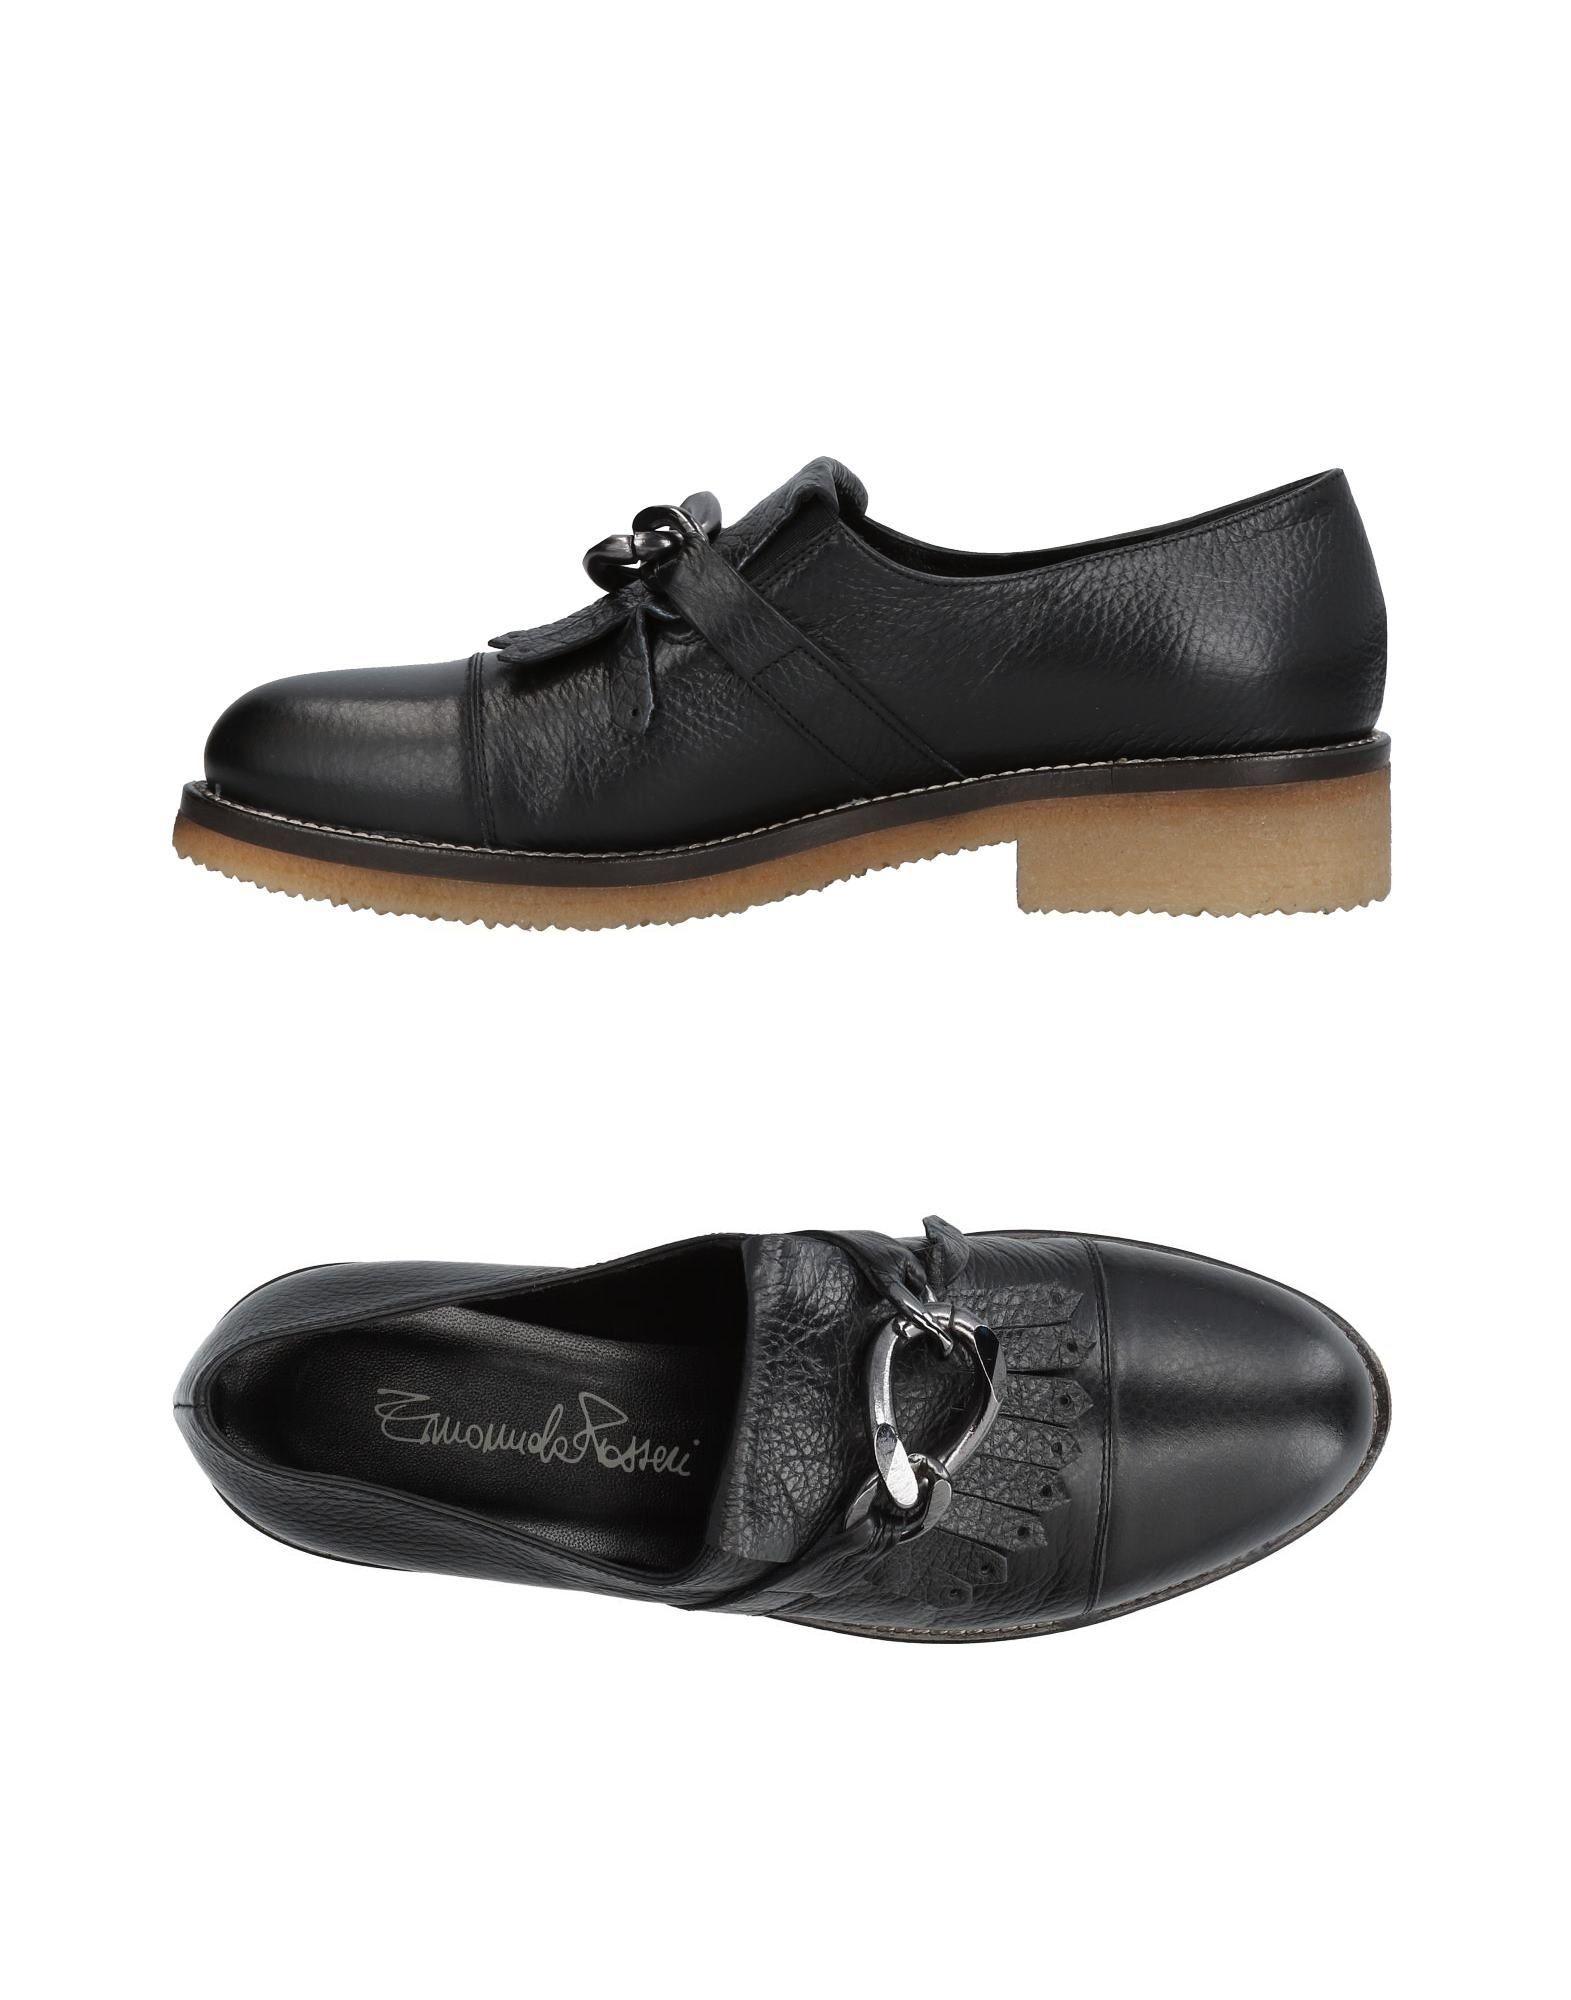 Emanuela Passeri Mokassins Damen  11444649LC Gute Qualität beliebte Schuhe